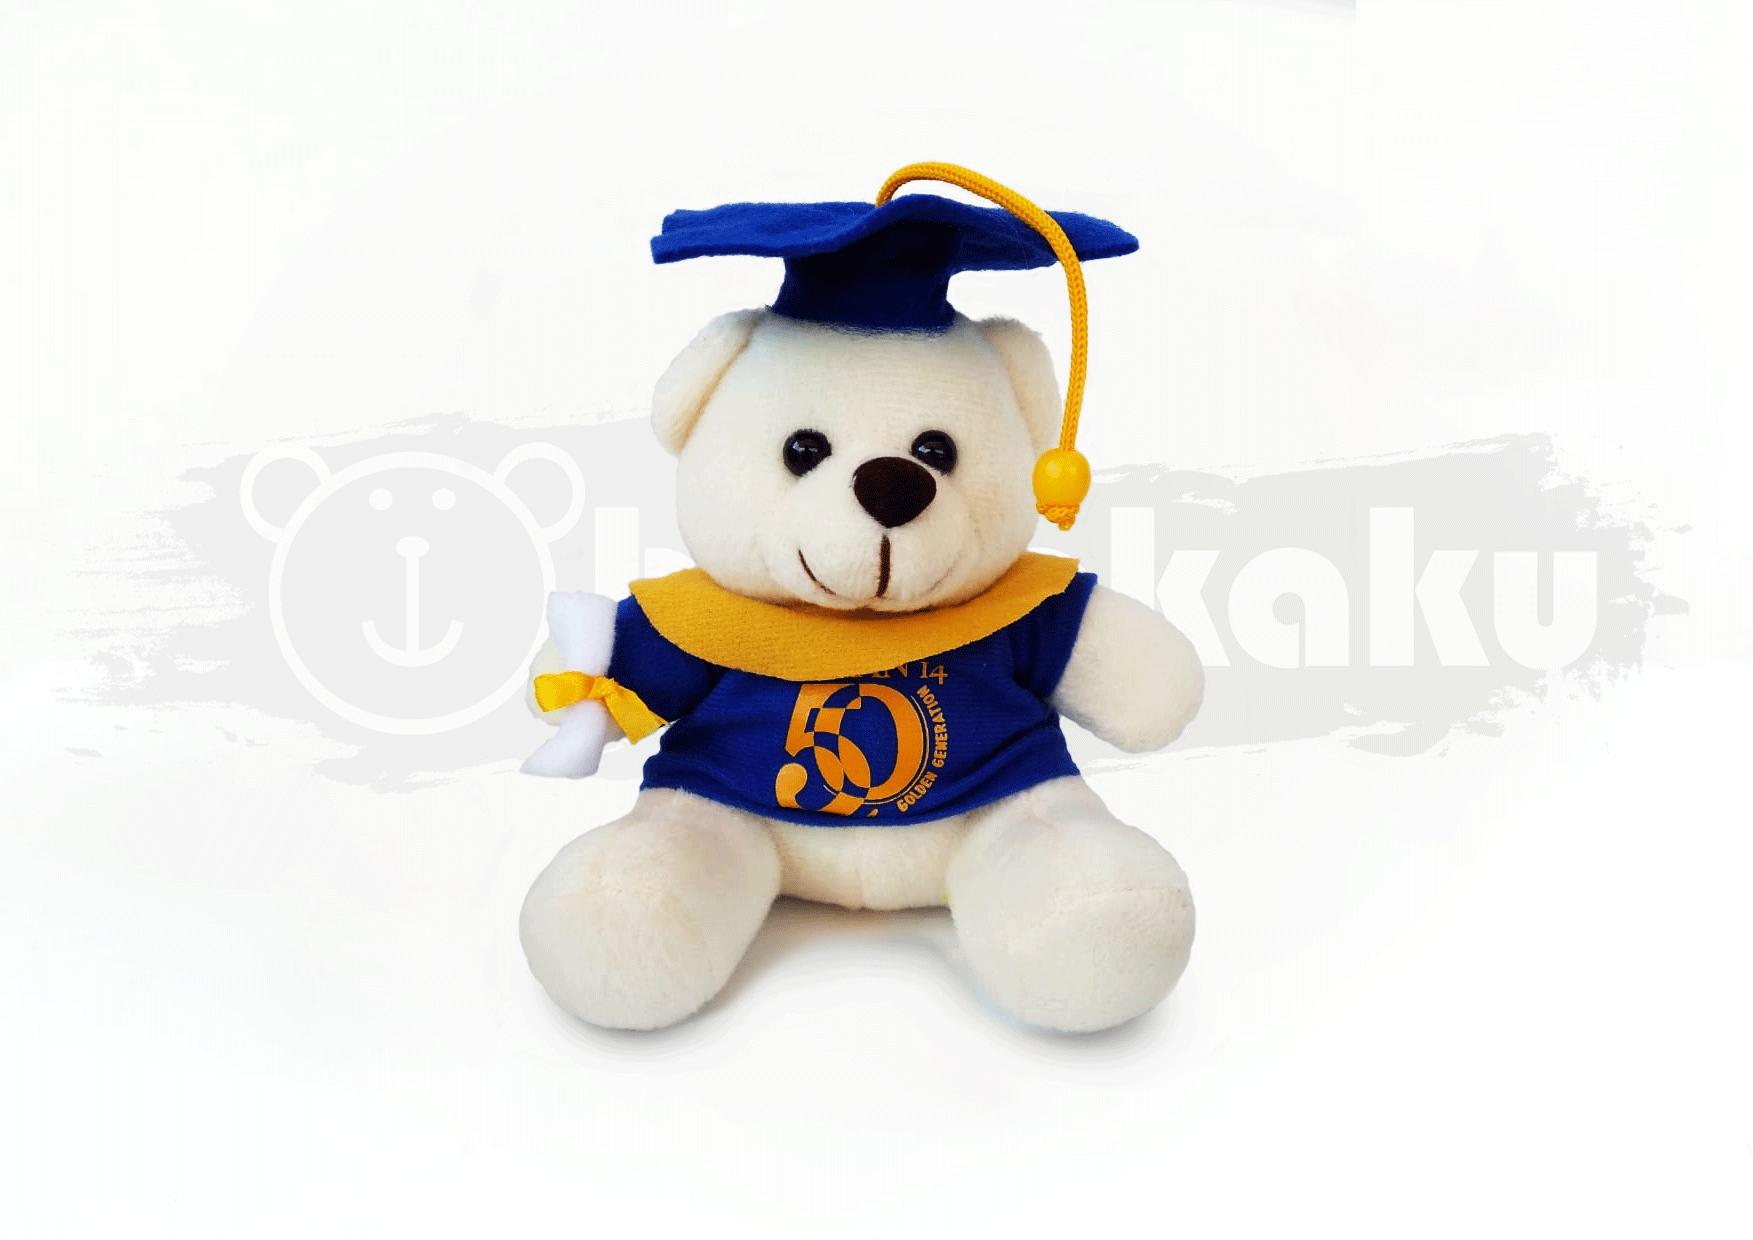 Graduation series - Vico Bear Image